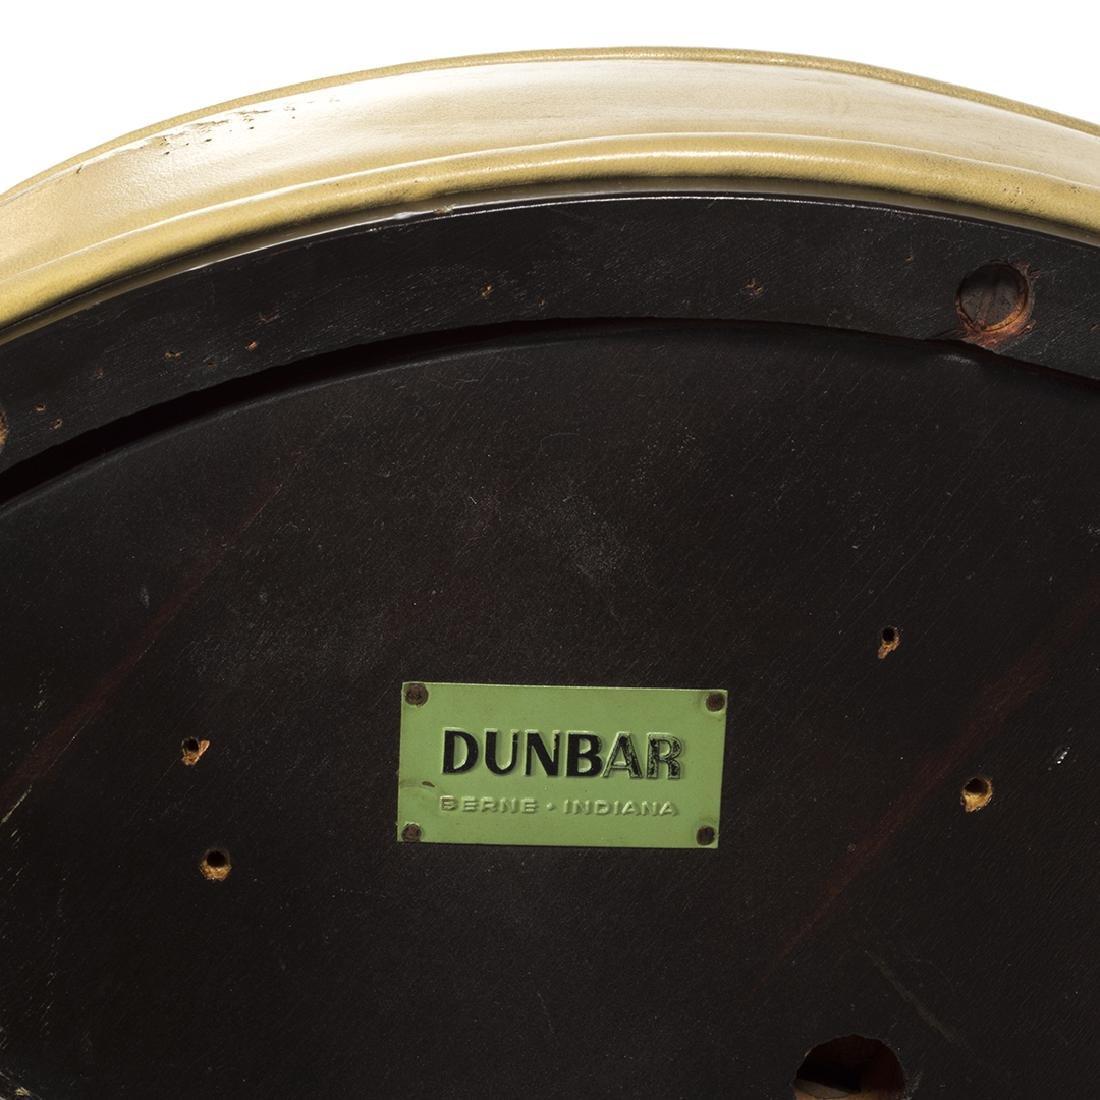 Dunbar Mahogany Chair - 5